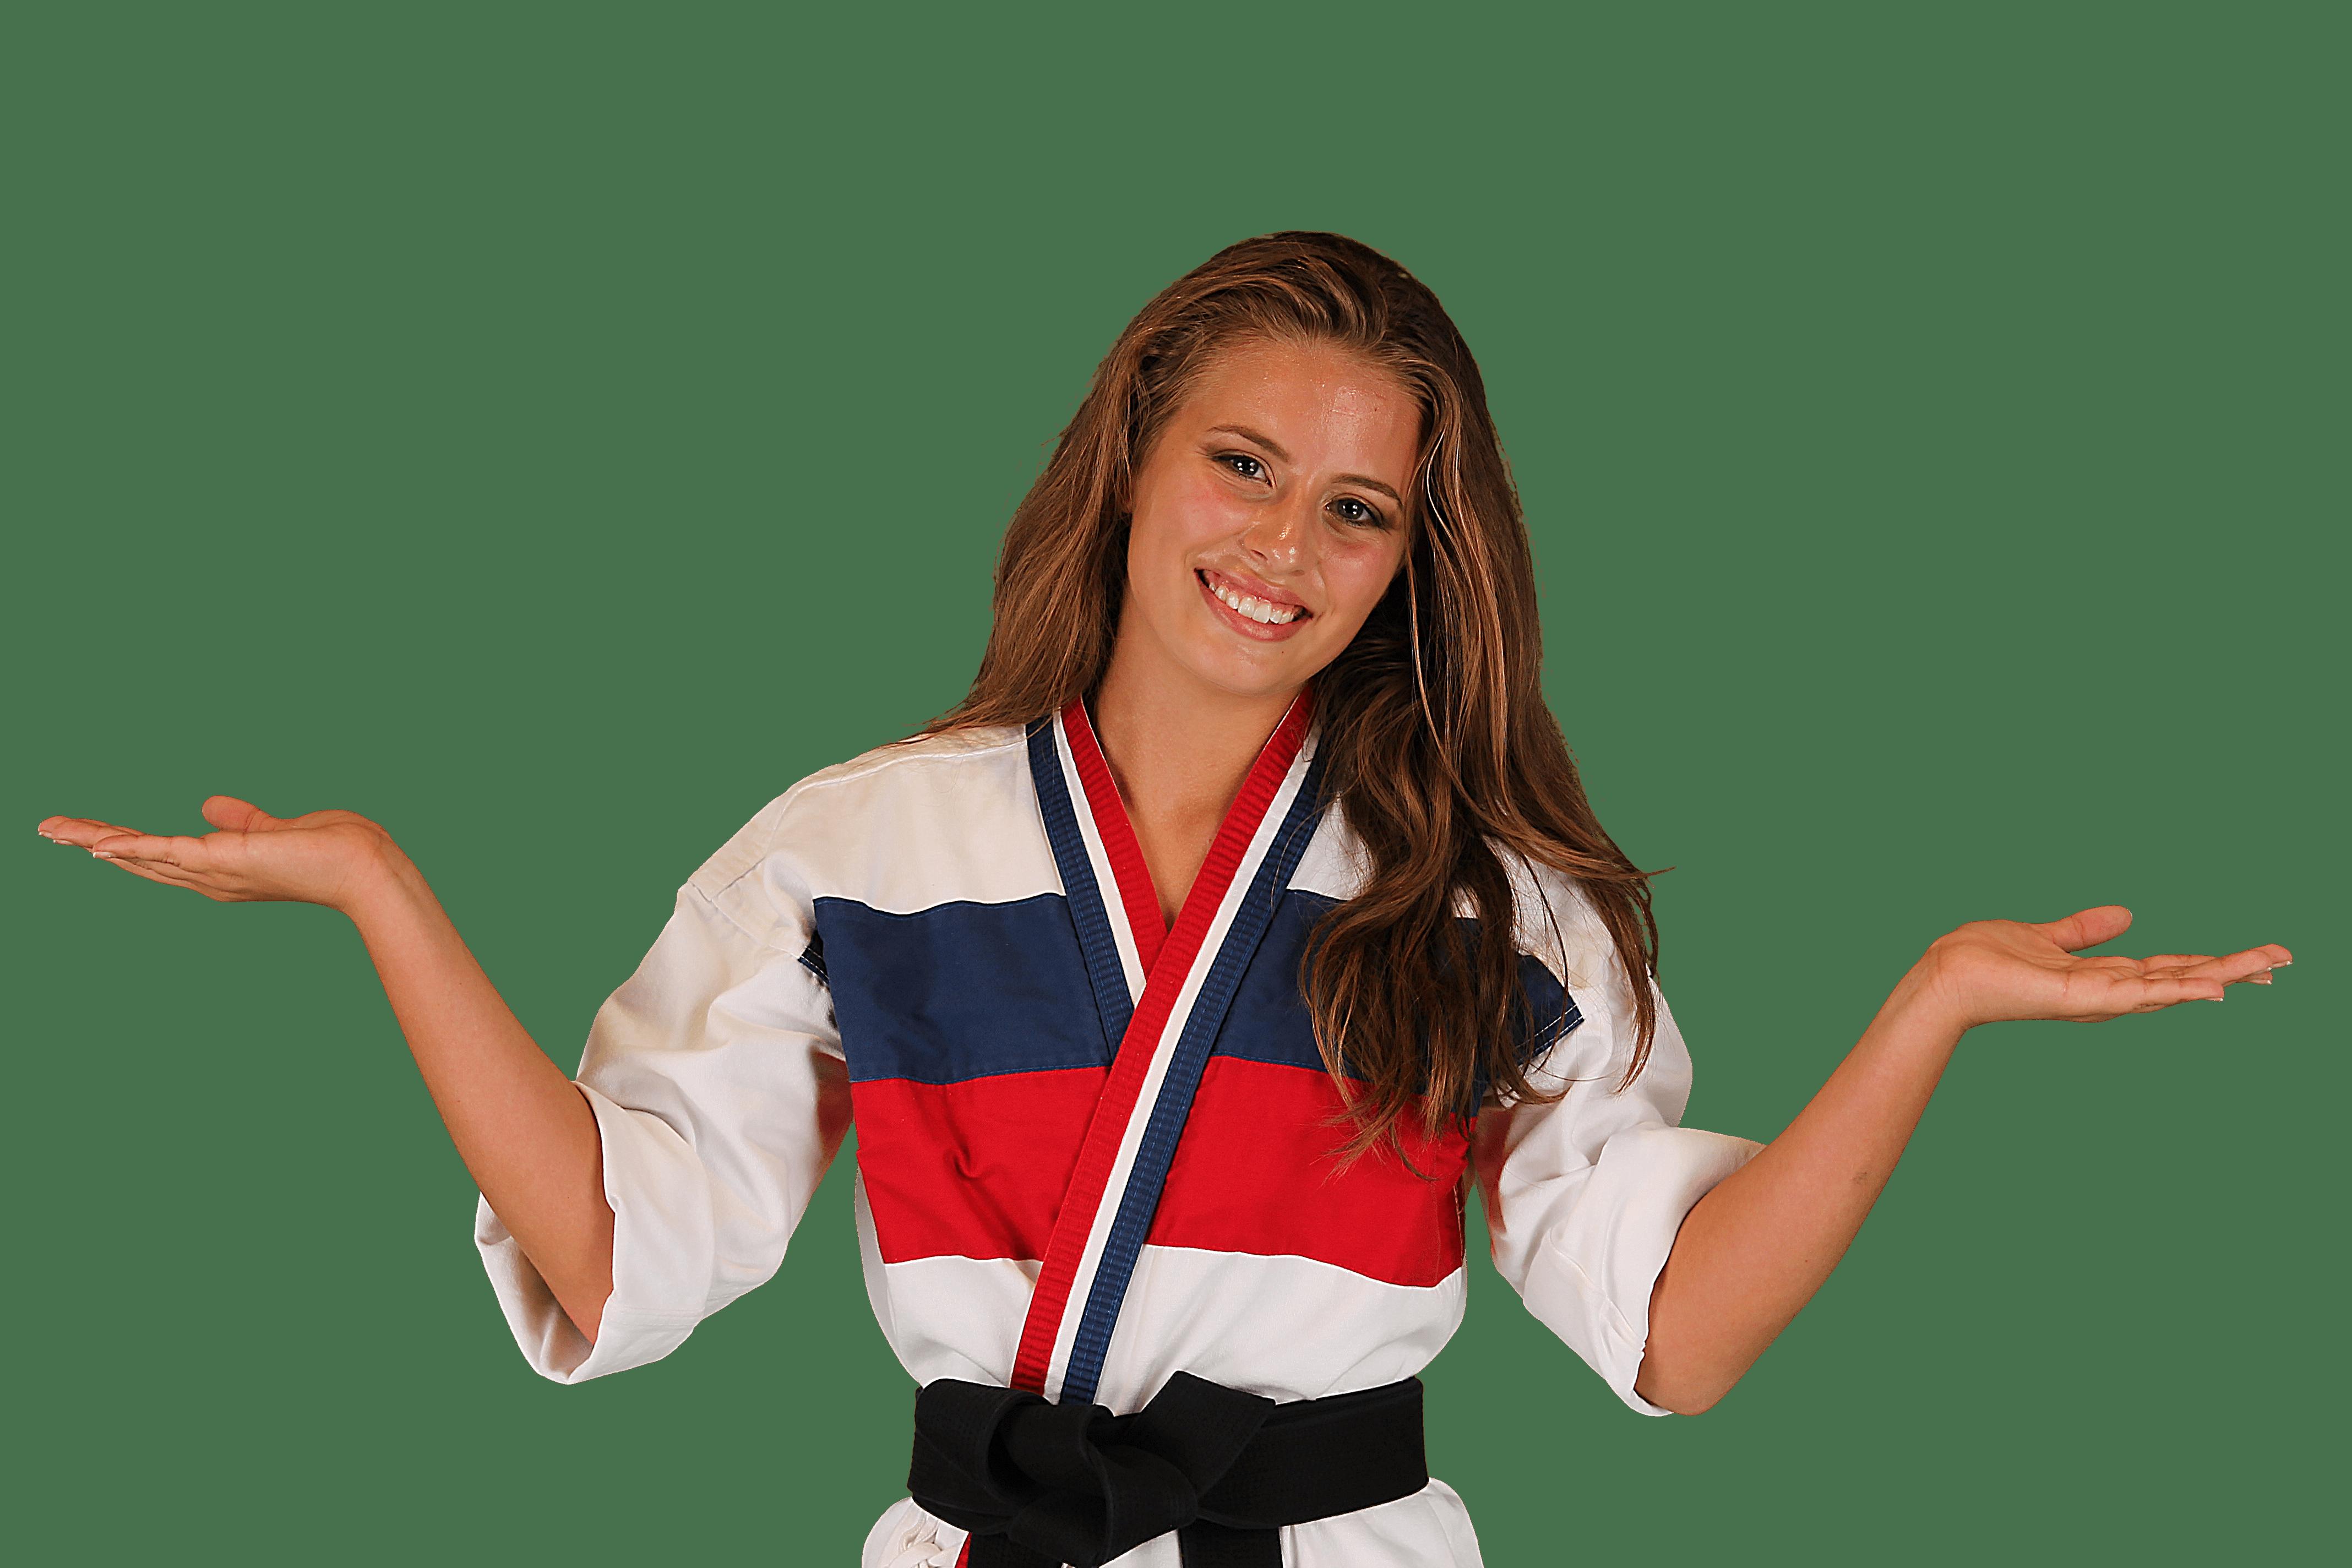 Hannah Smith in Jonesboro - Joey Perry Martial Arts Academy